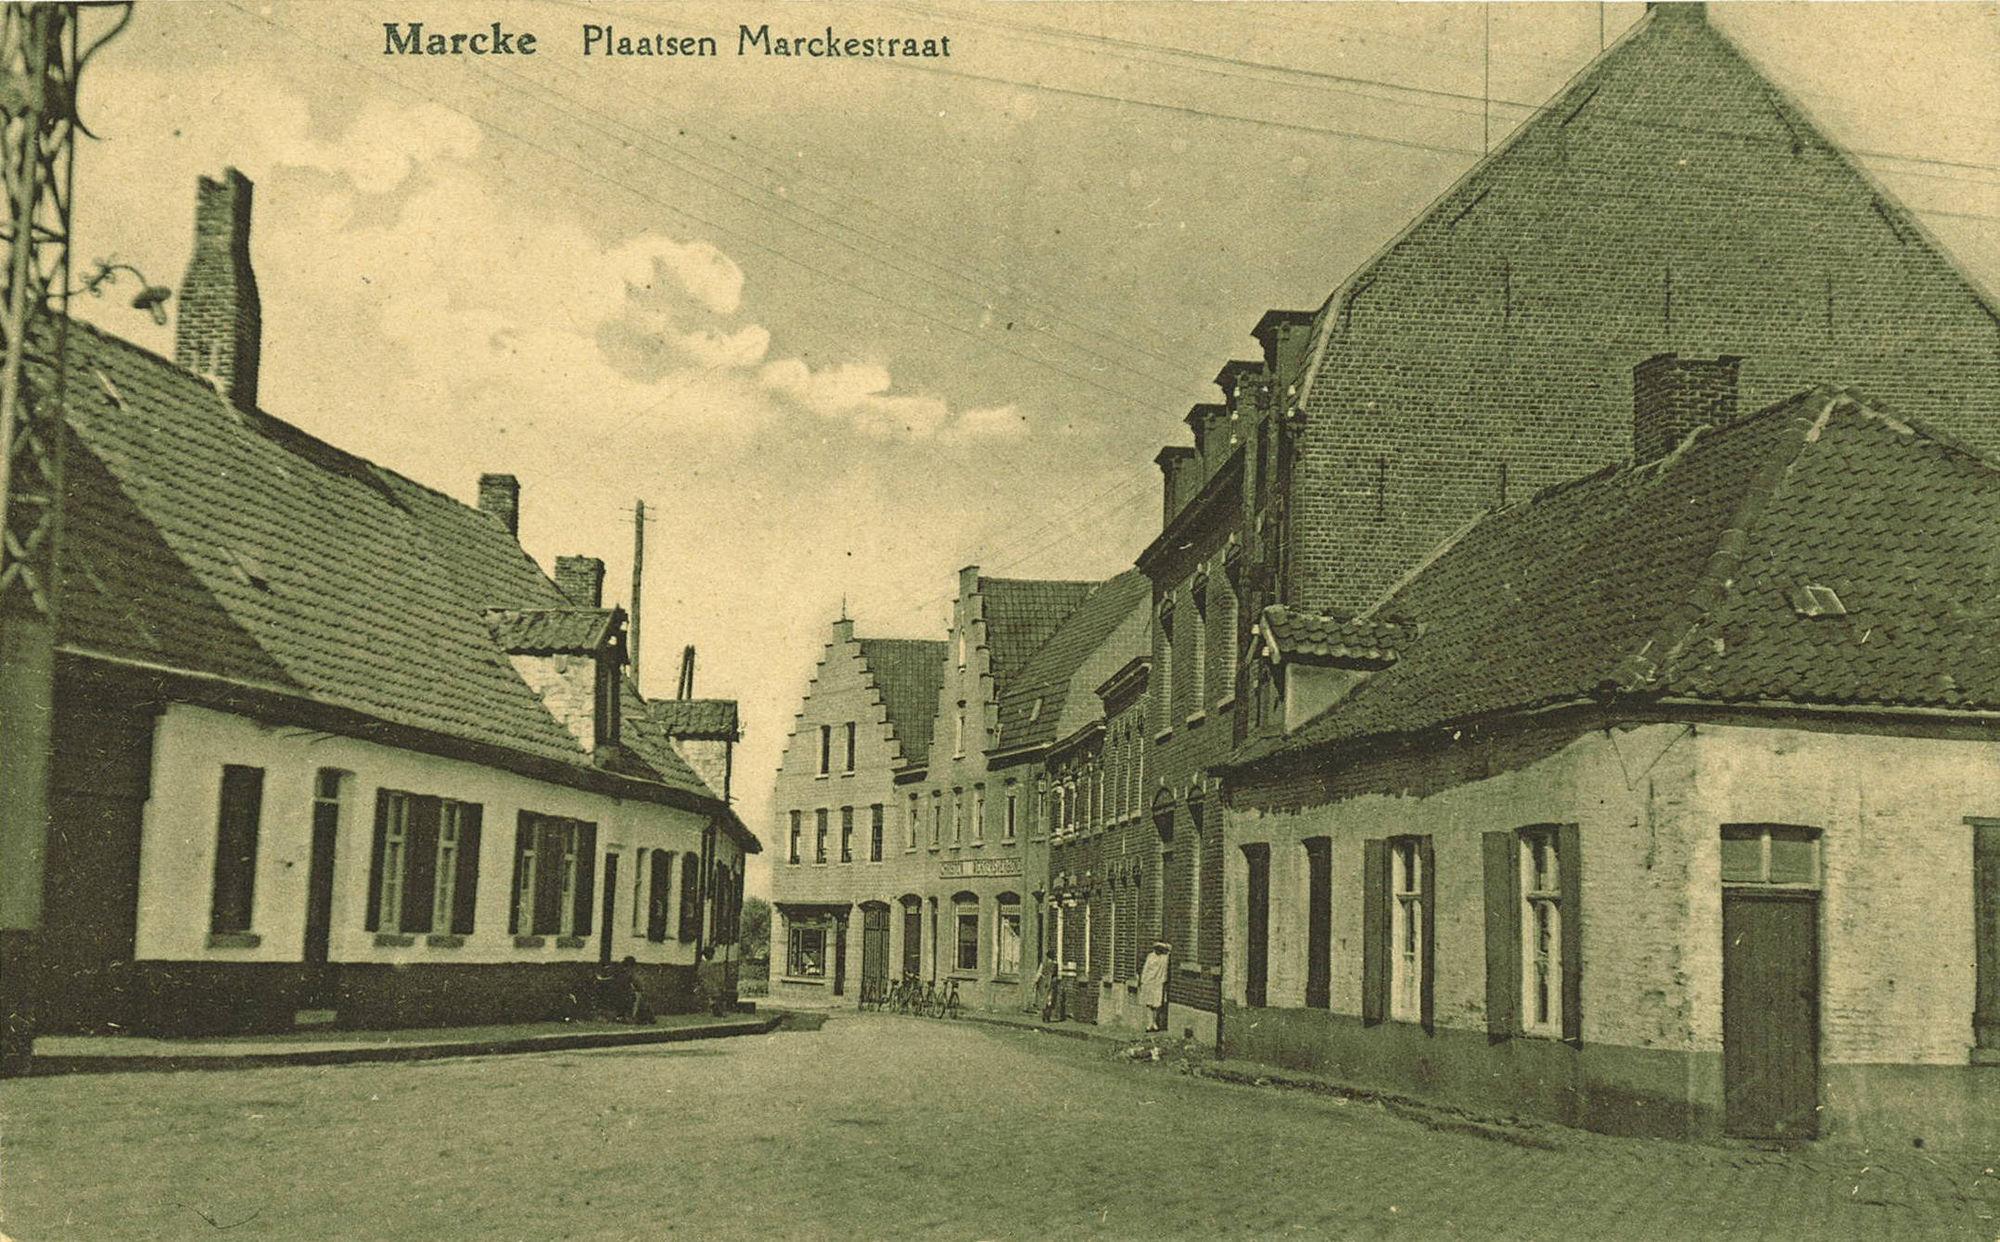 Marksestraat in Marke